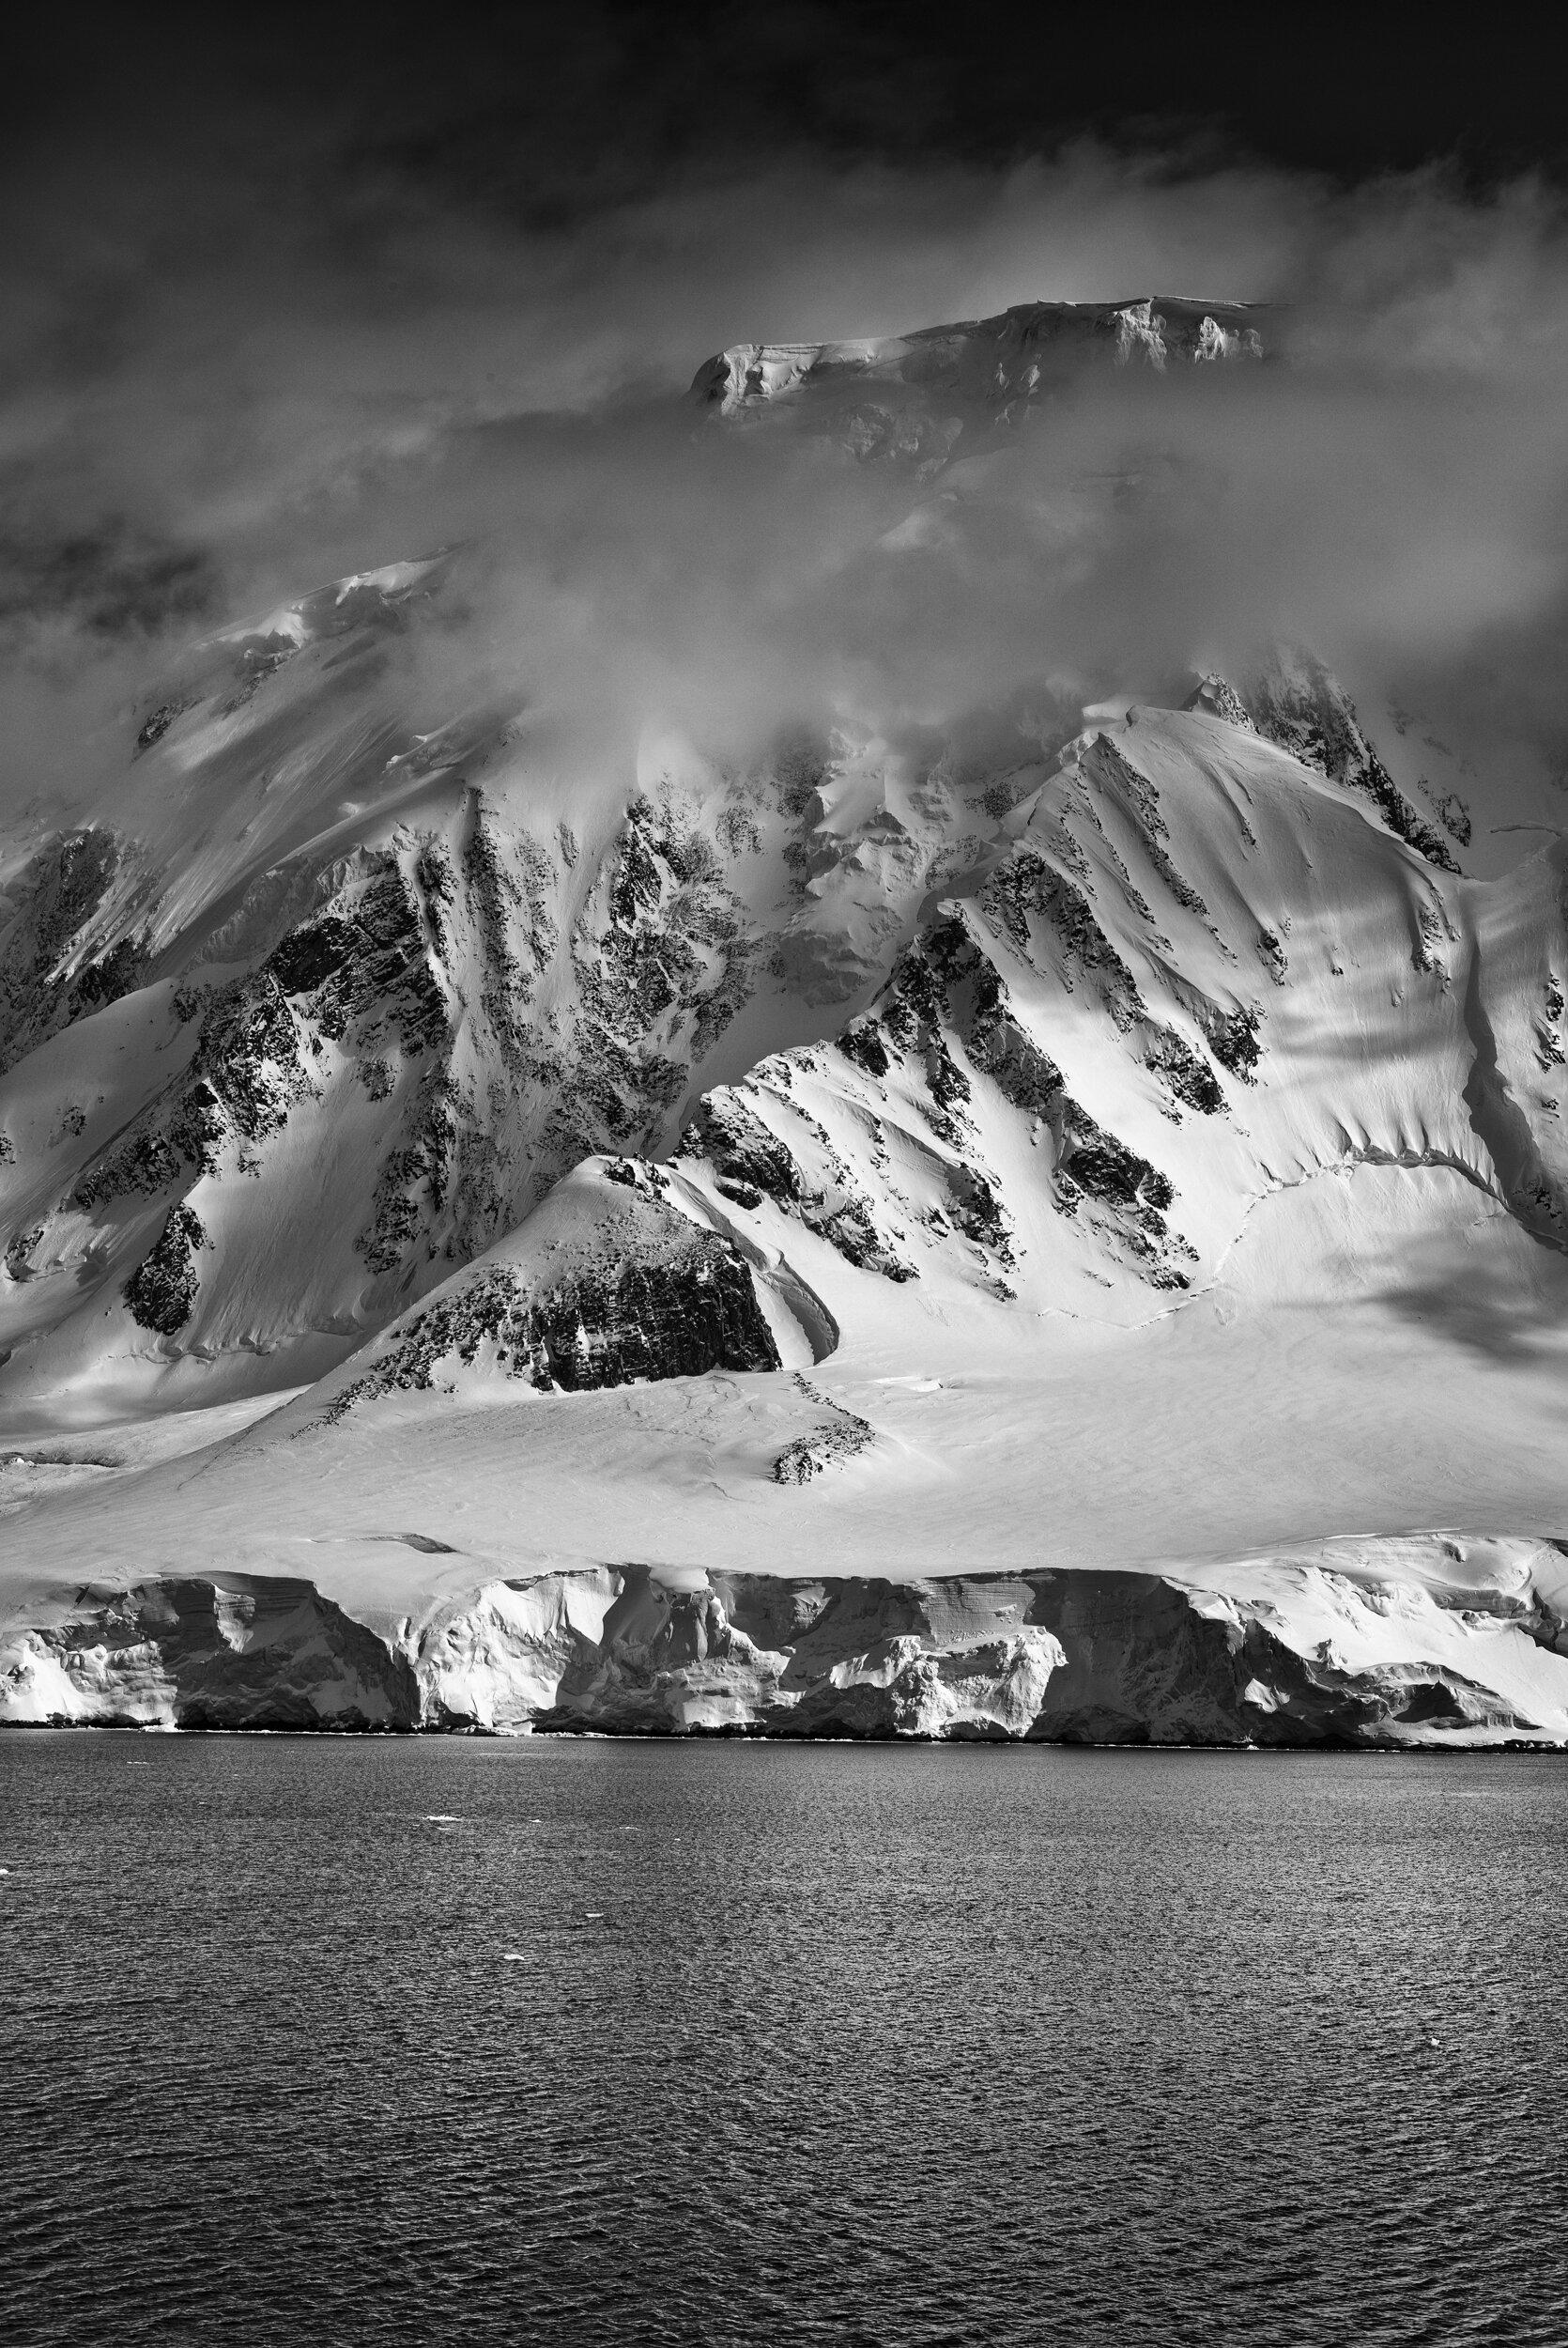 manuel_uebler_antarctica_bw_010.jpg